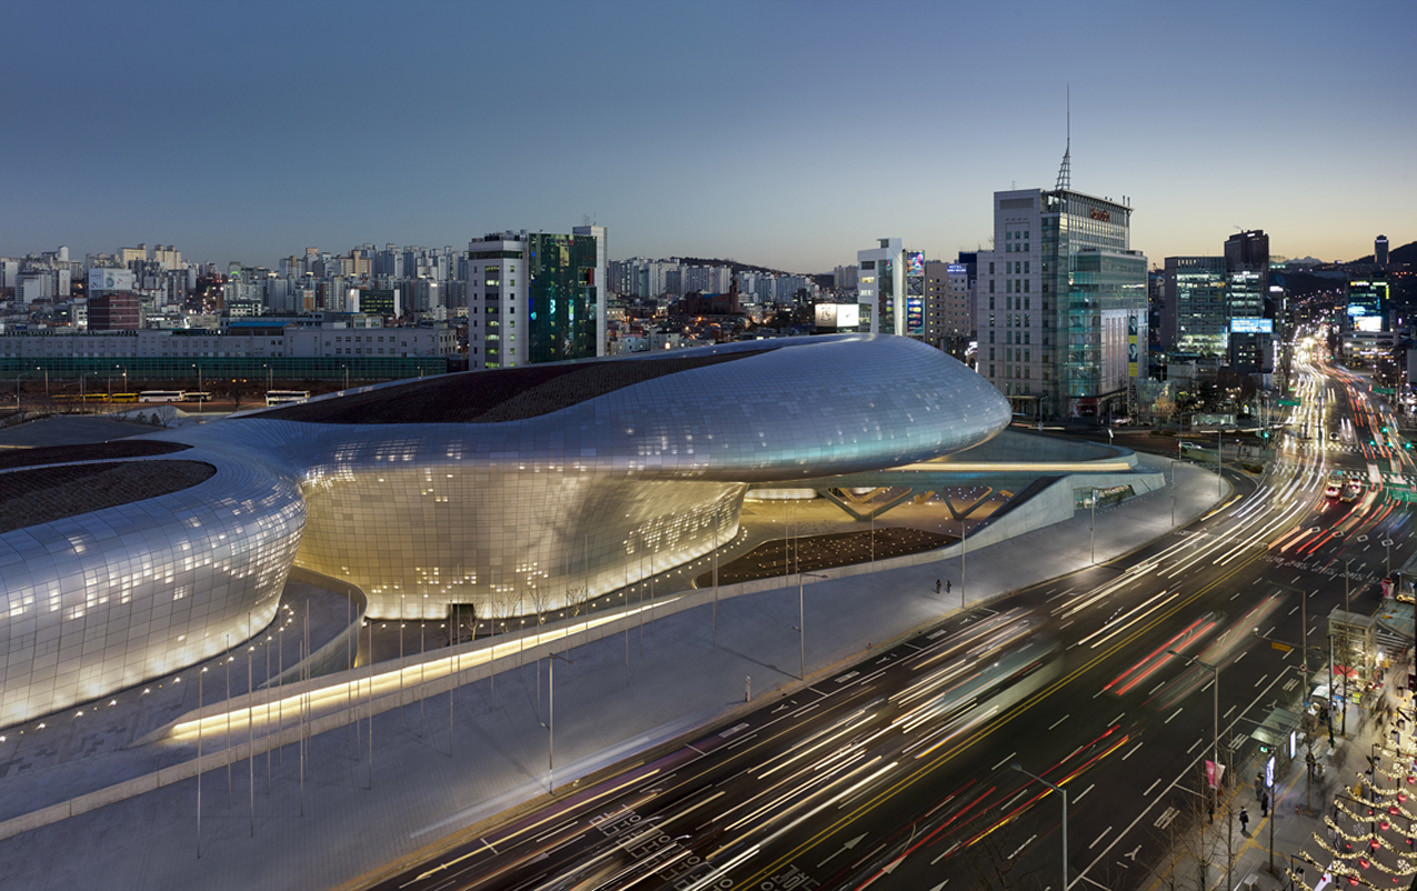 Dongdaemun Design Plaza / Zaha Hadid Architects